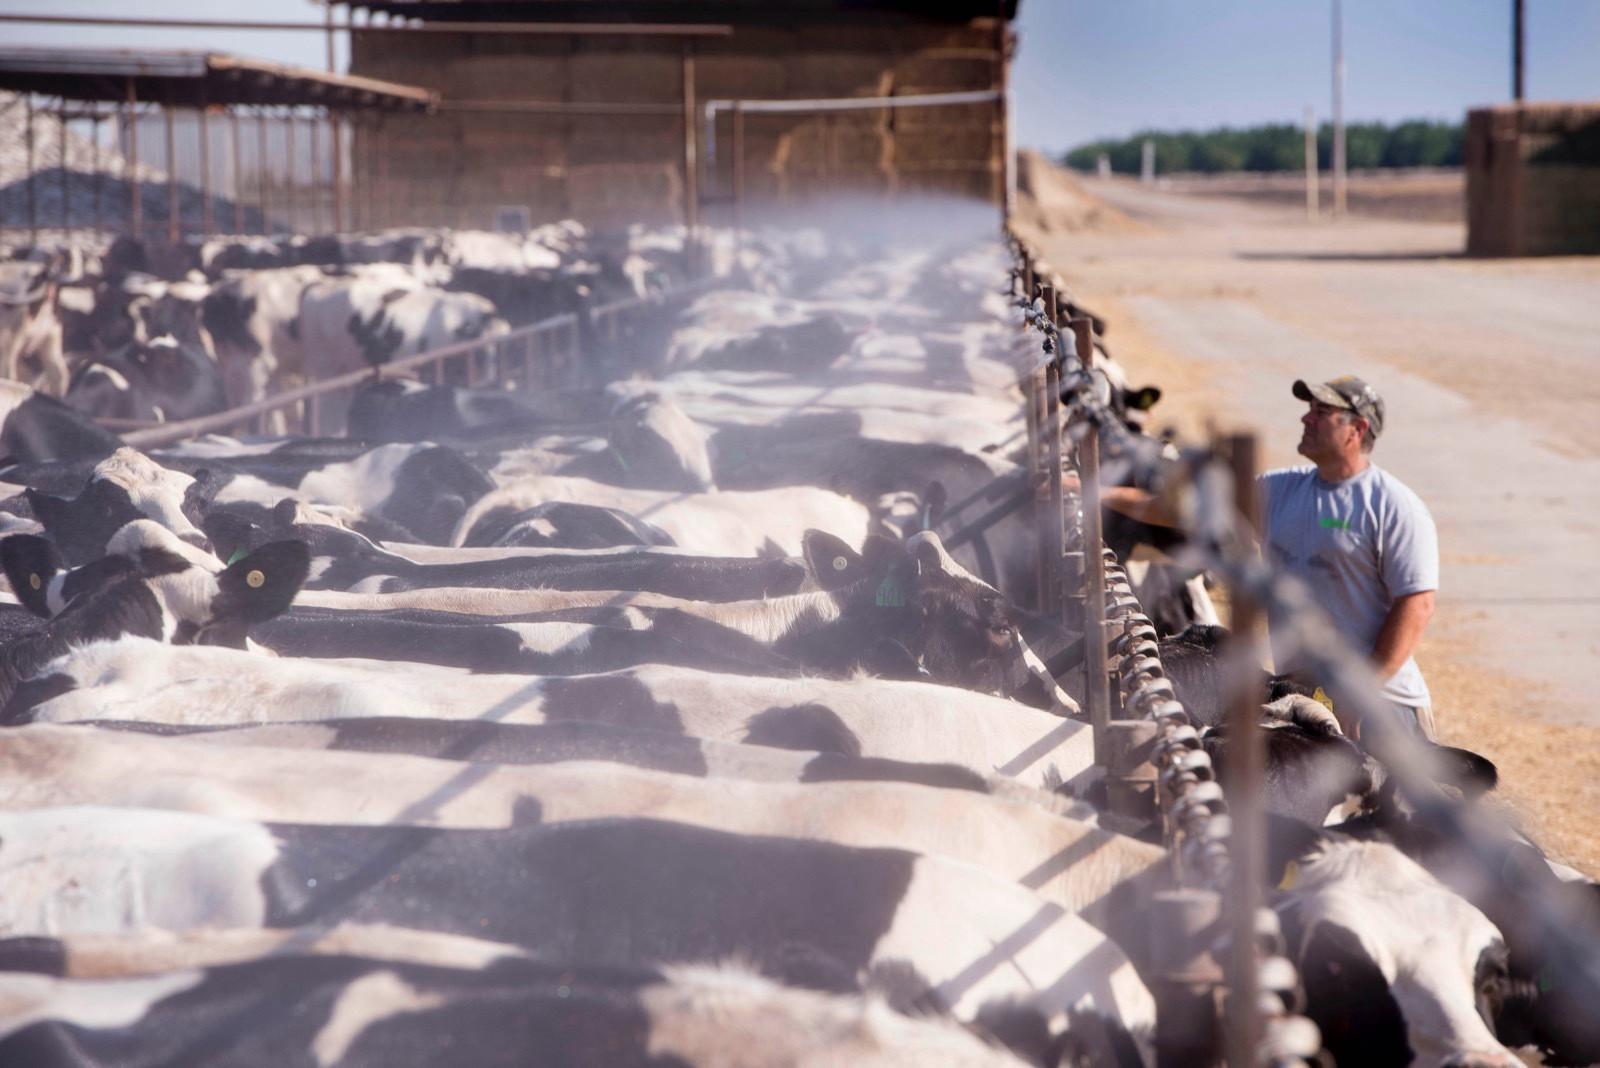 Each year, CRV uses 20 bulls in the US